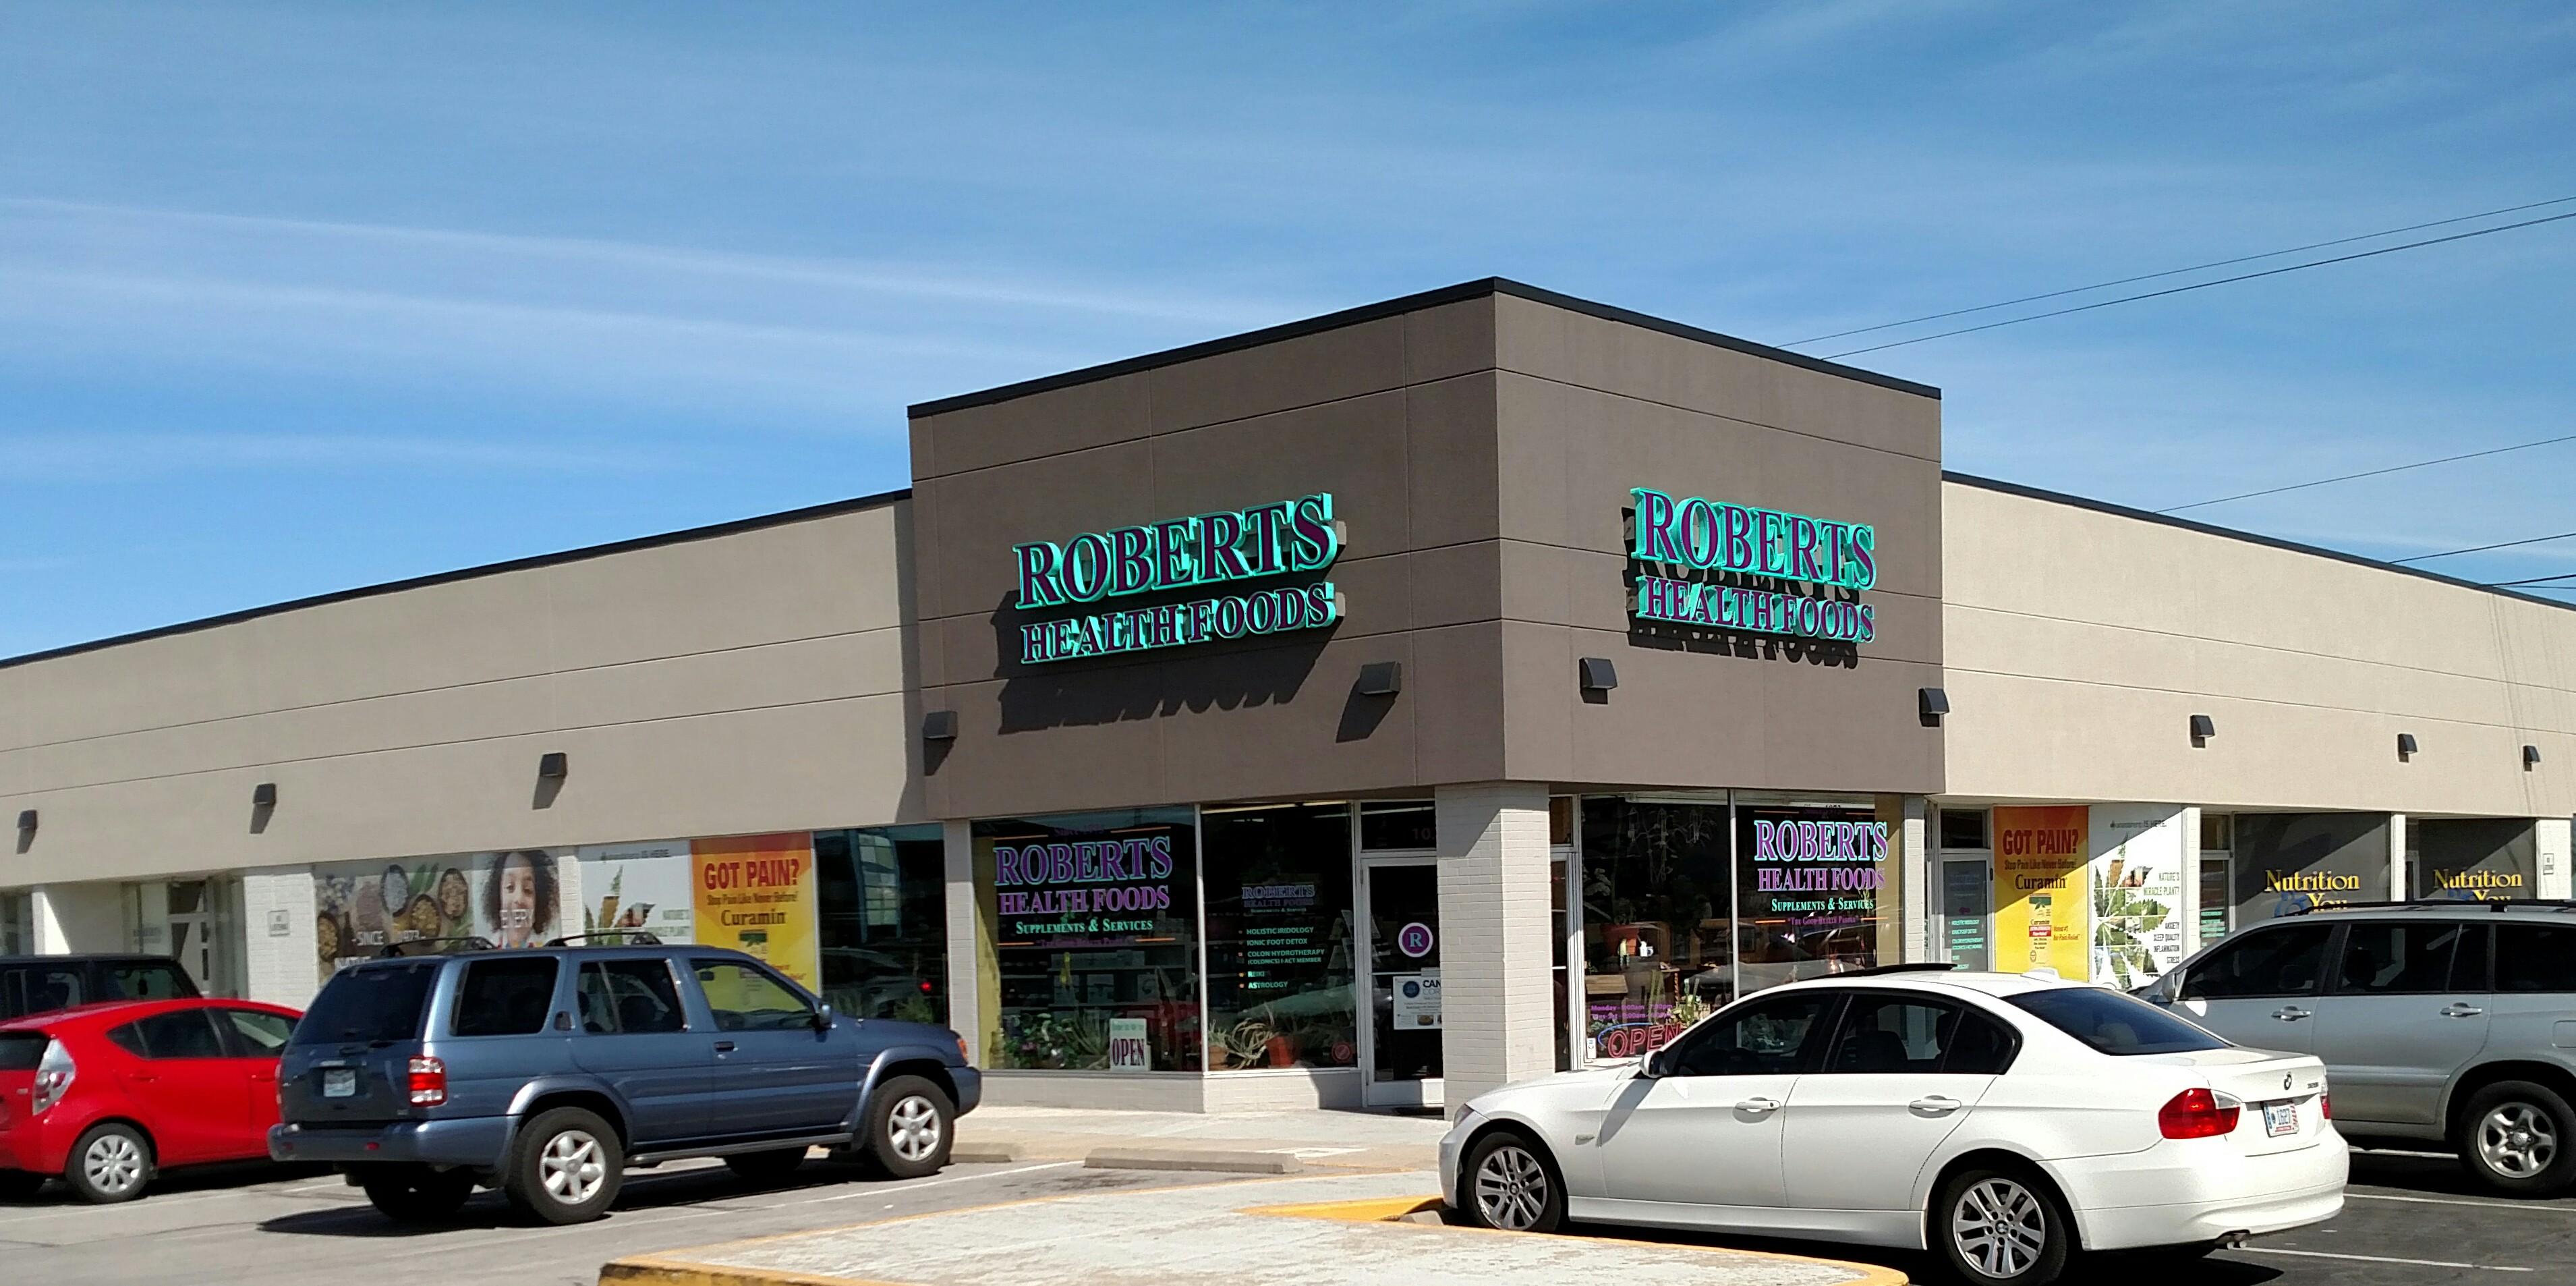 Roberts Health Foods image 4